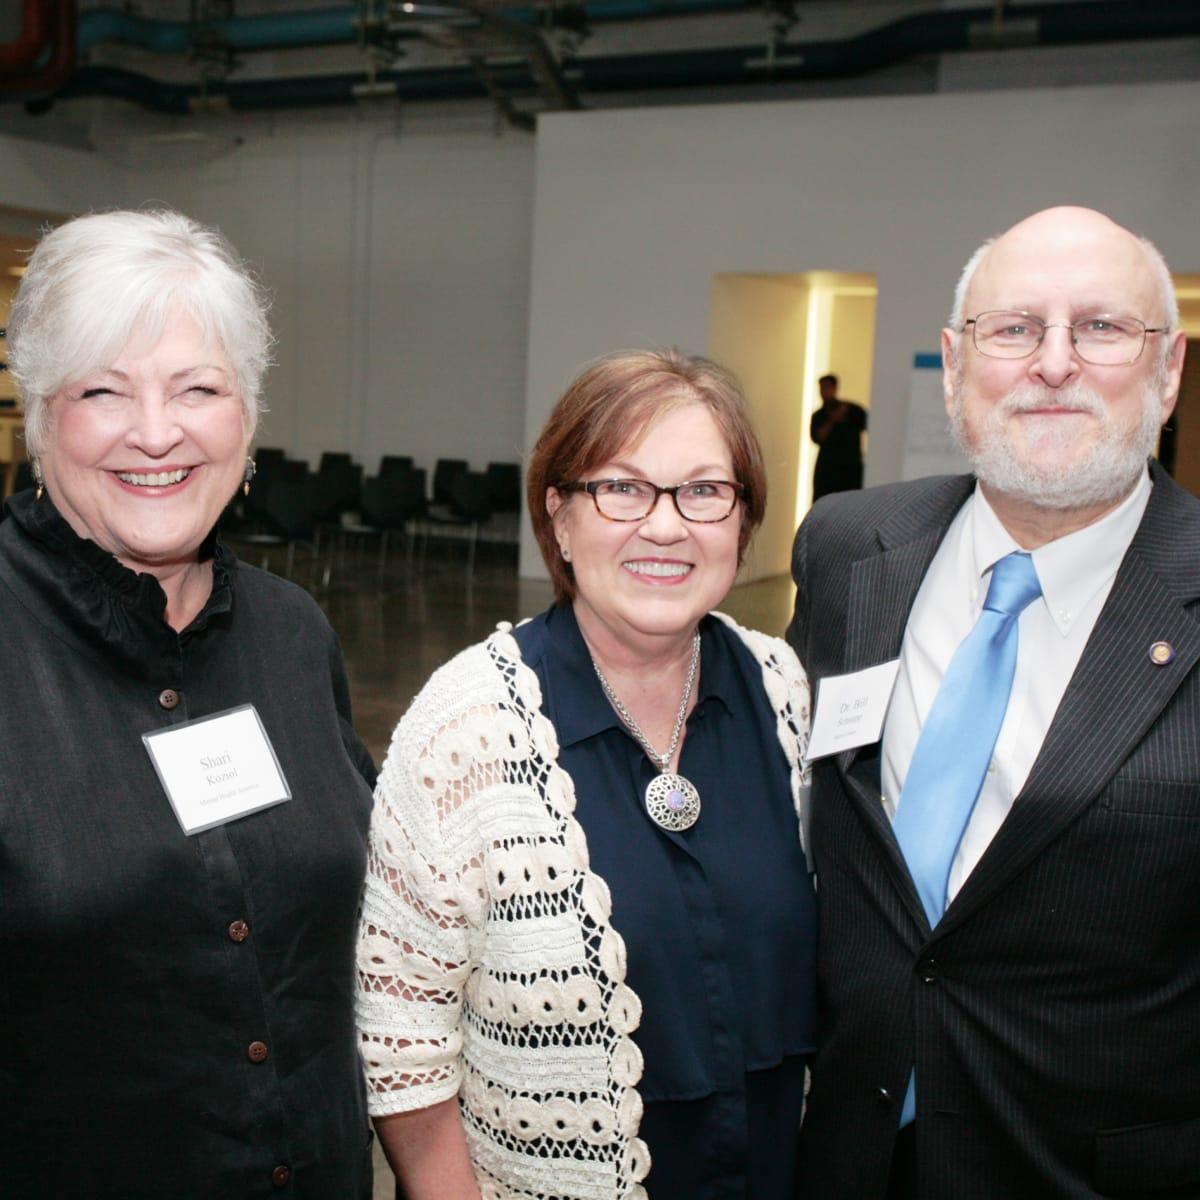 Menninger Bridge Up Shari Koziol, Susan Fordice, Bill Schnapp